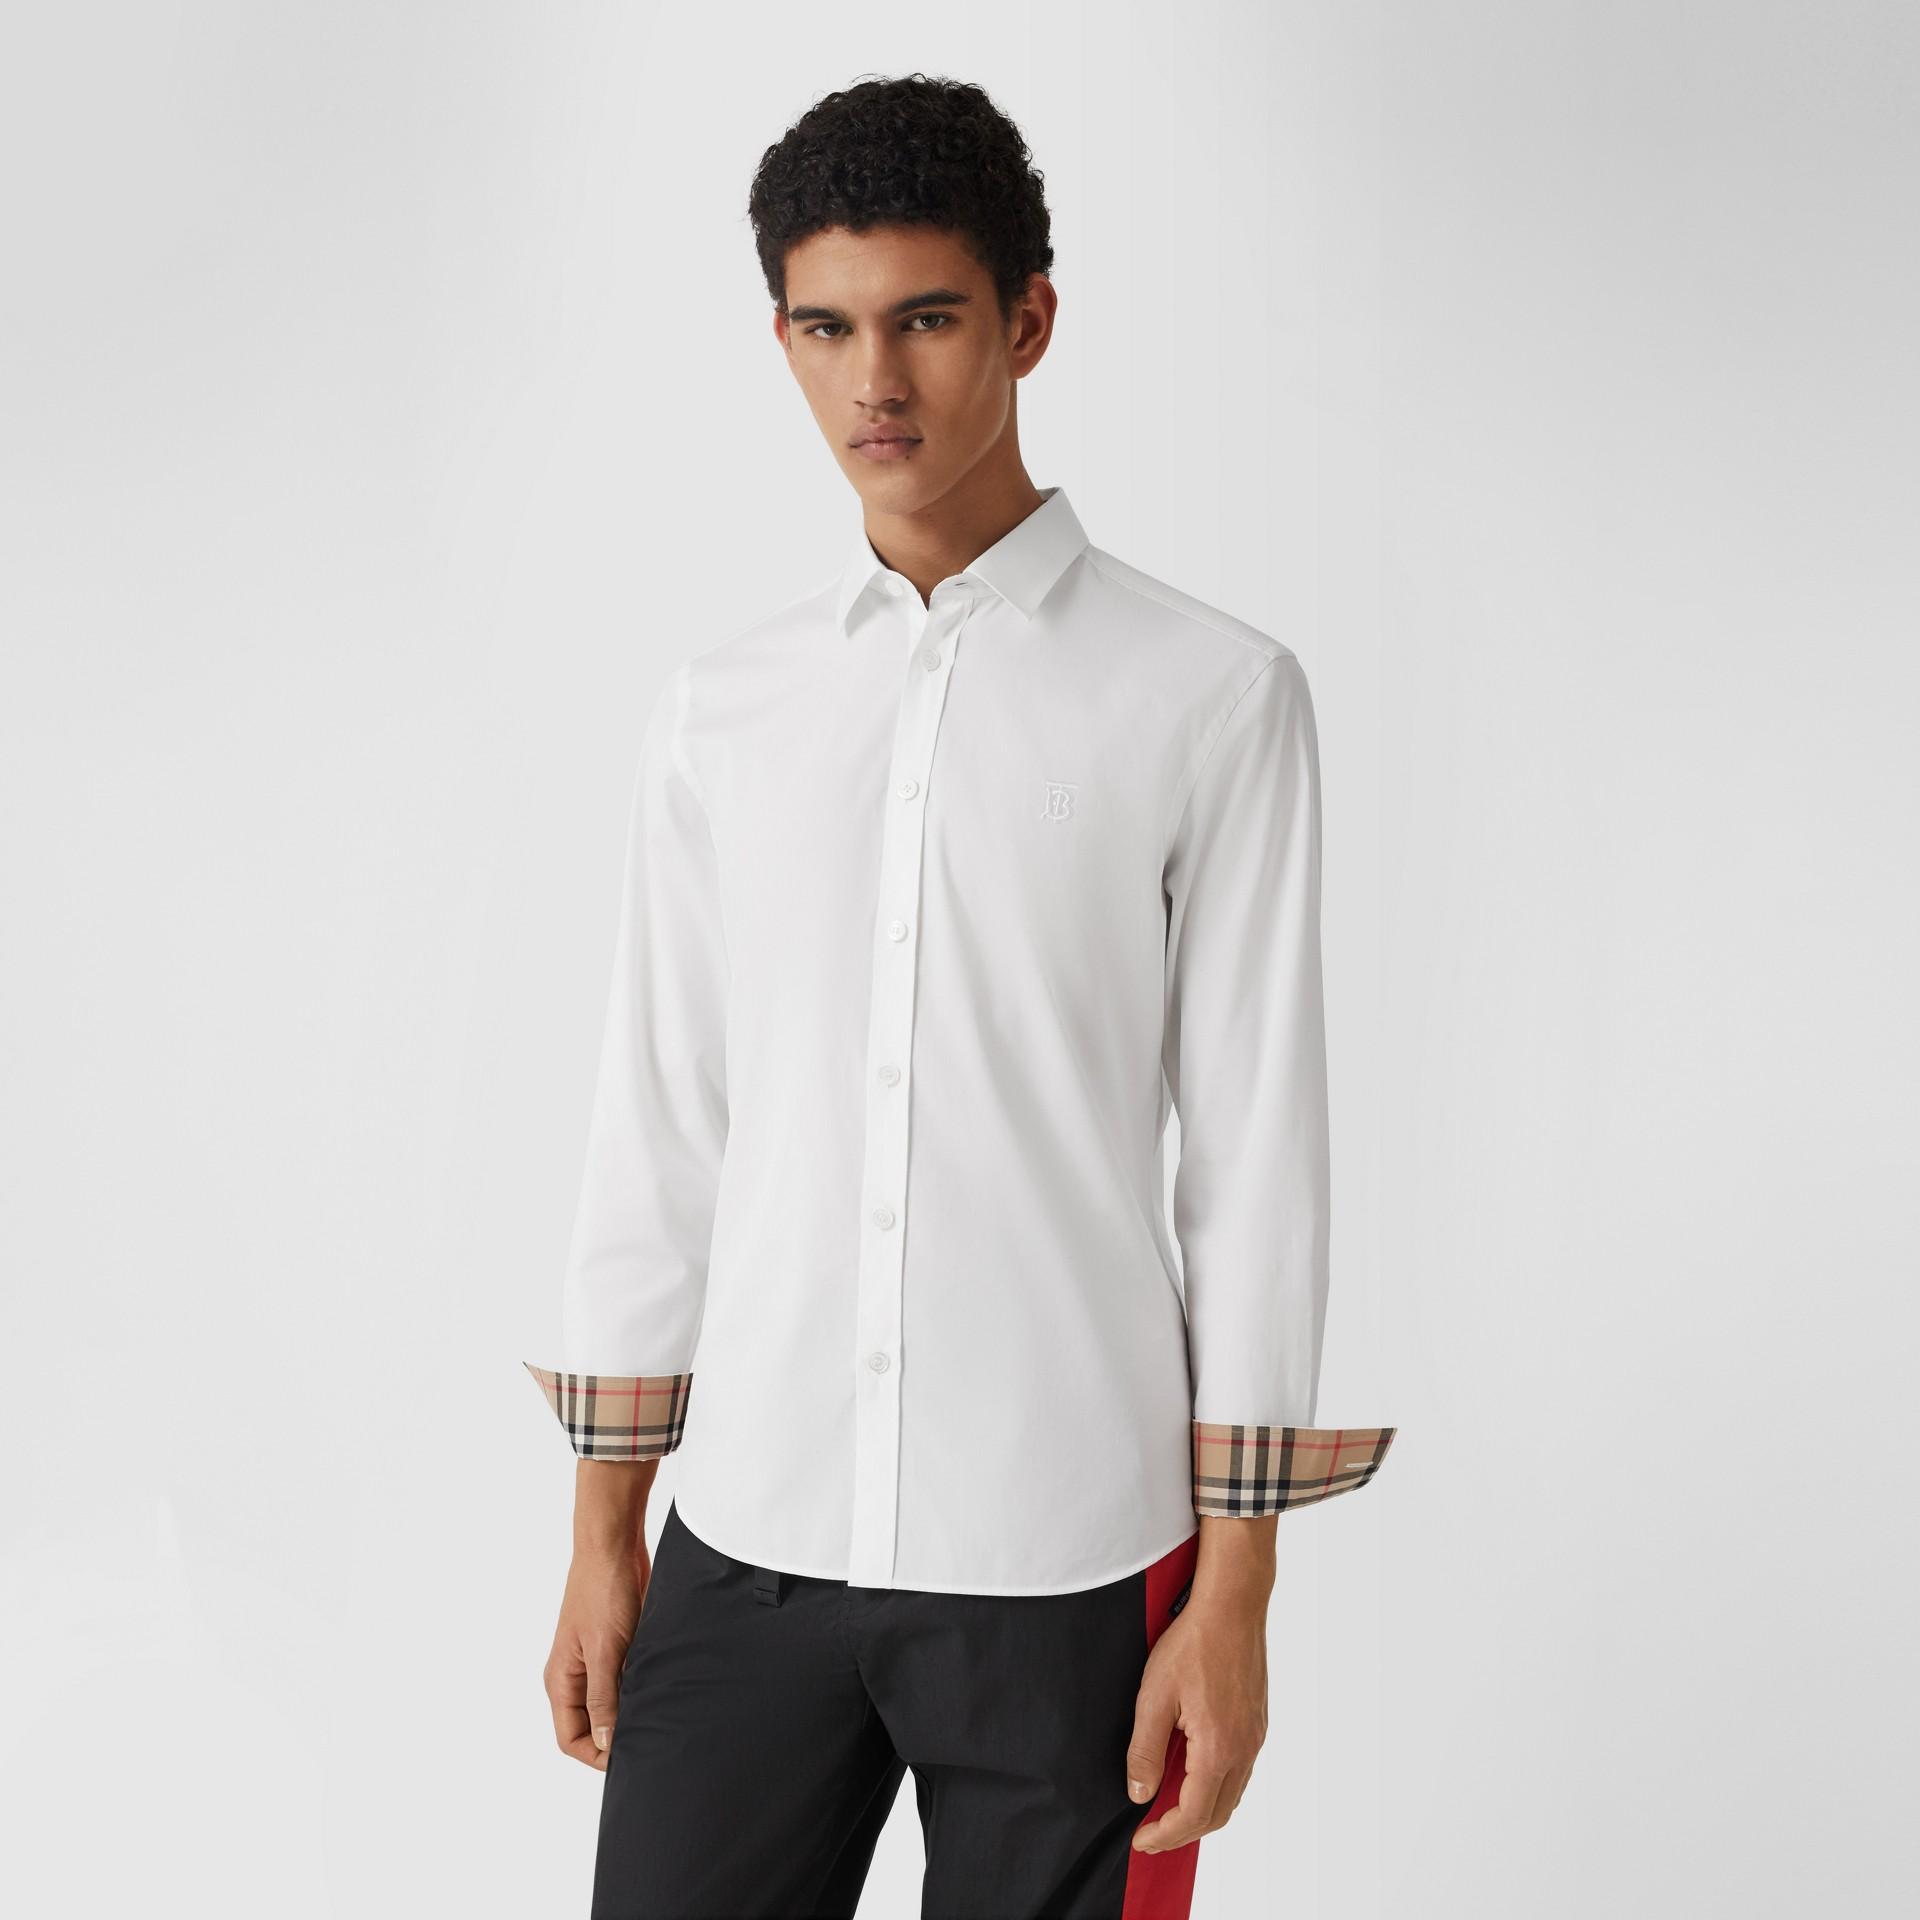 Slim Fit Monogram Motif Stretch Cotton Poplin Shirt in White - Men | Burberry United States - gallery image 0